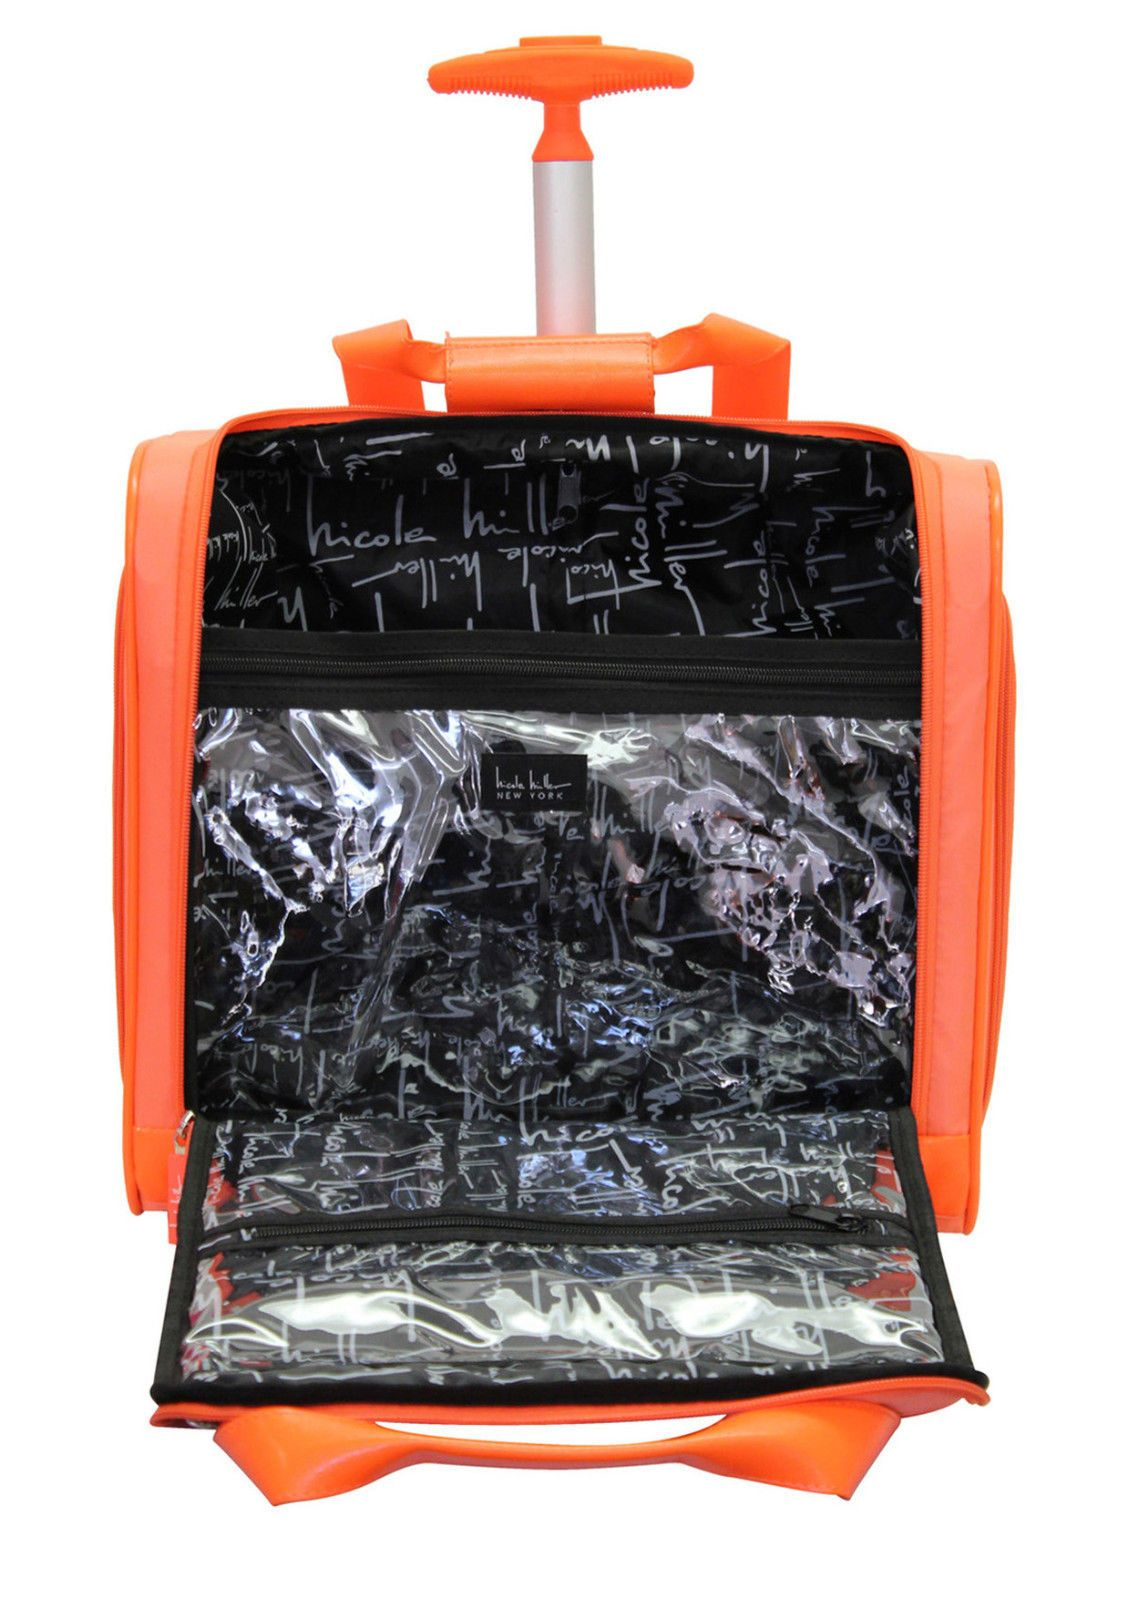 High Quality New Nicole Miller Orange Carry On Under Seat Bag Wheeled Luggage | EBay